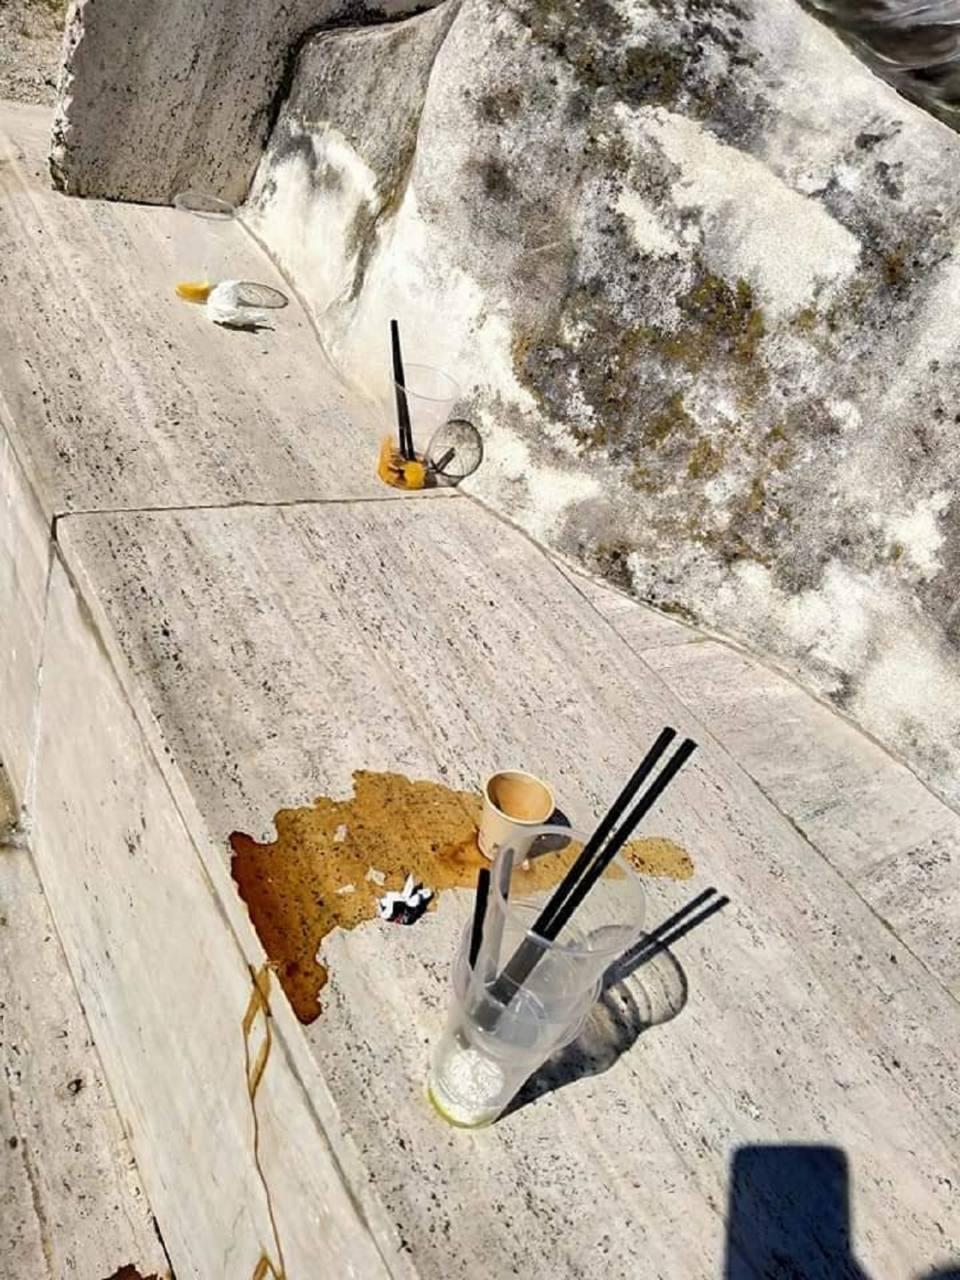 I rifiuti sul monumento a Castelfidardo